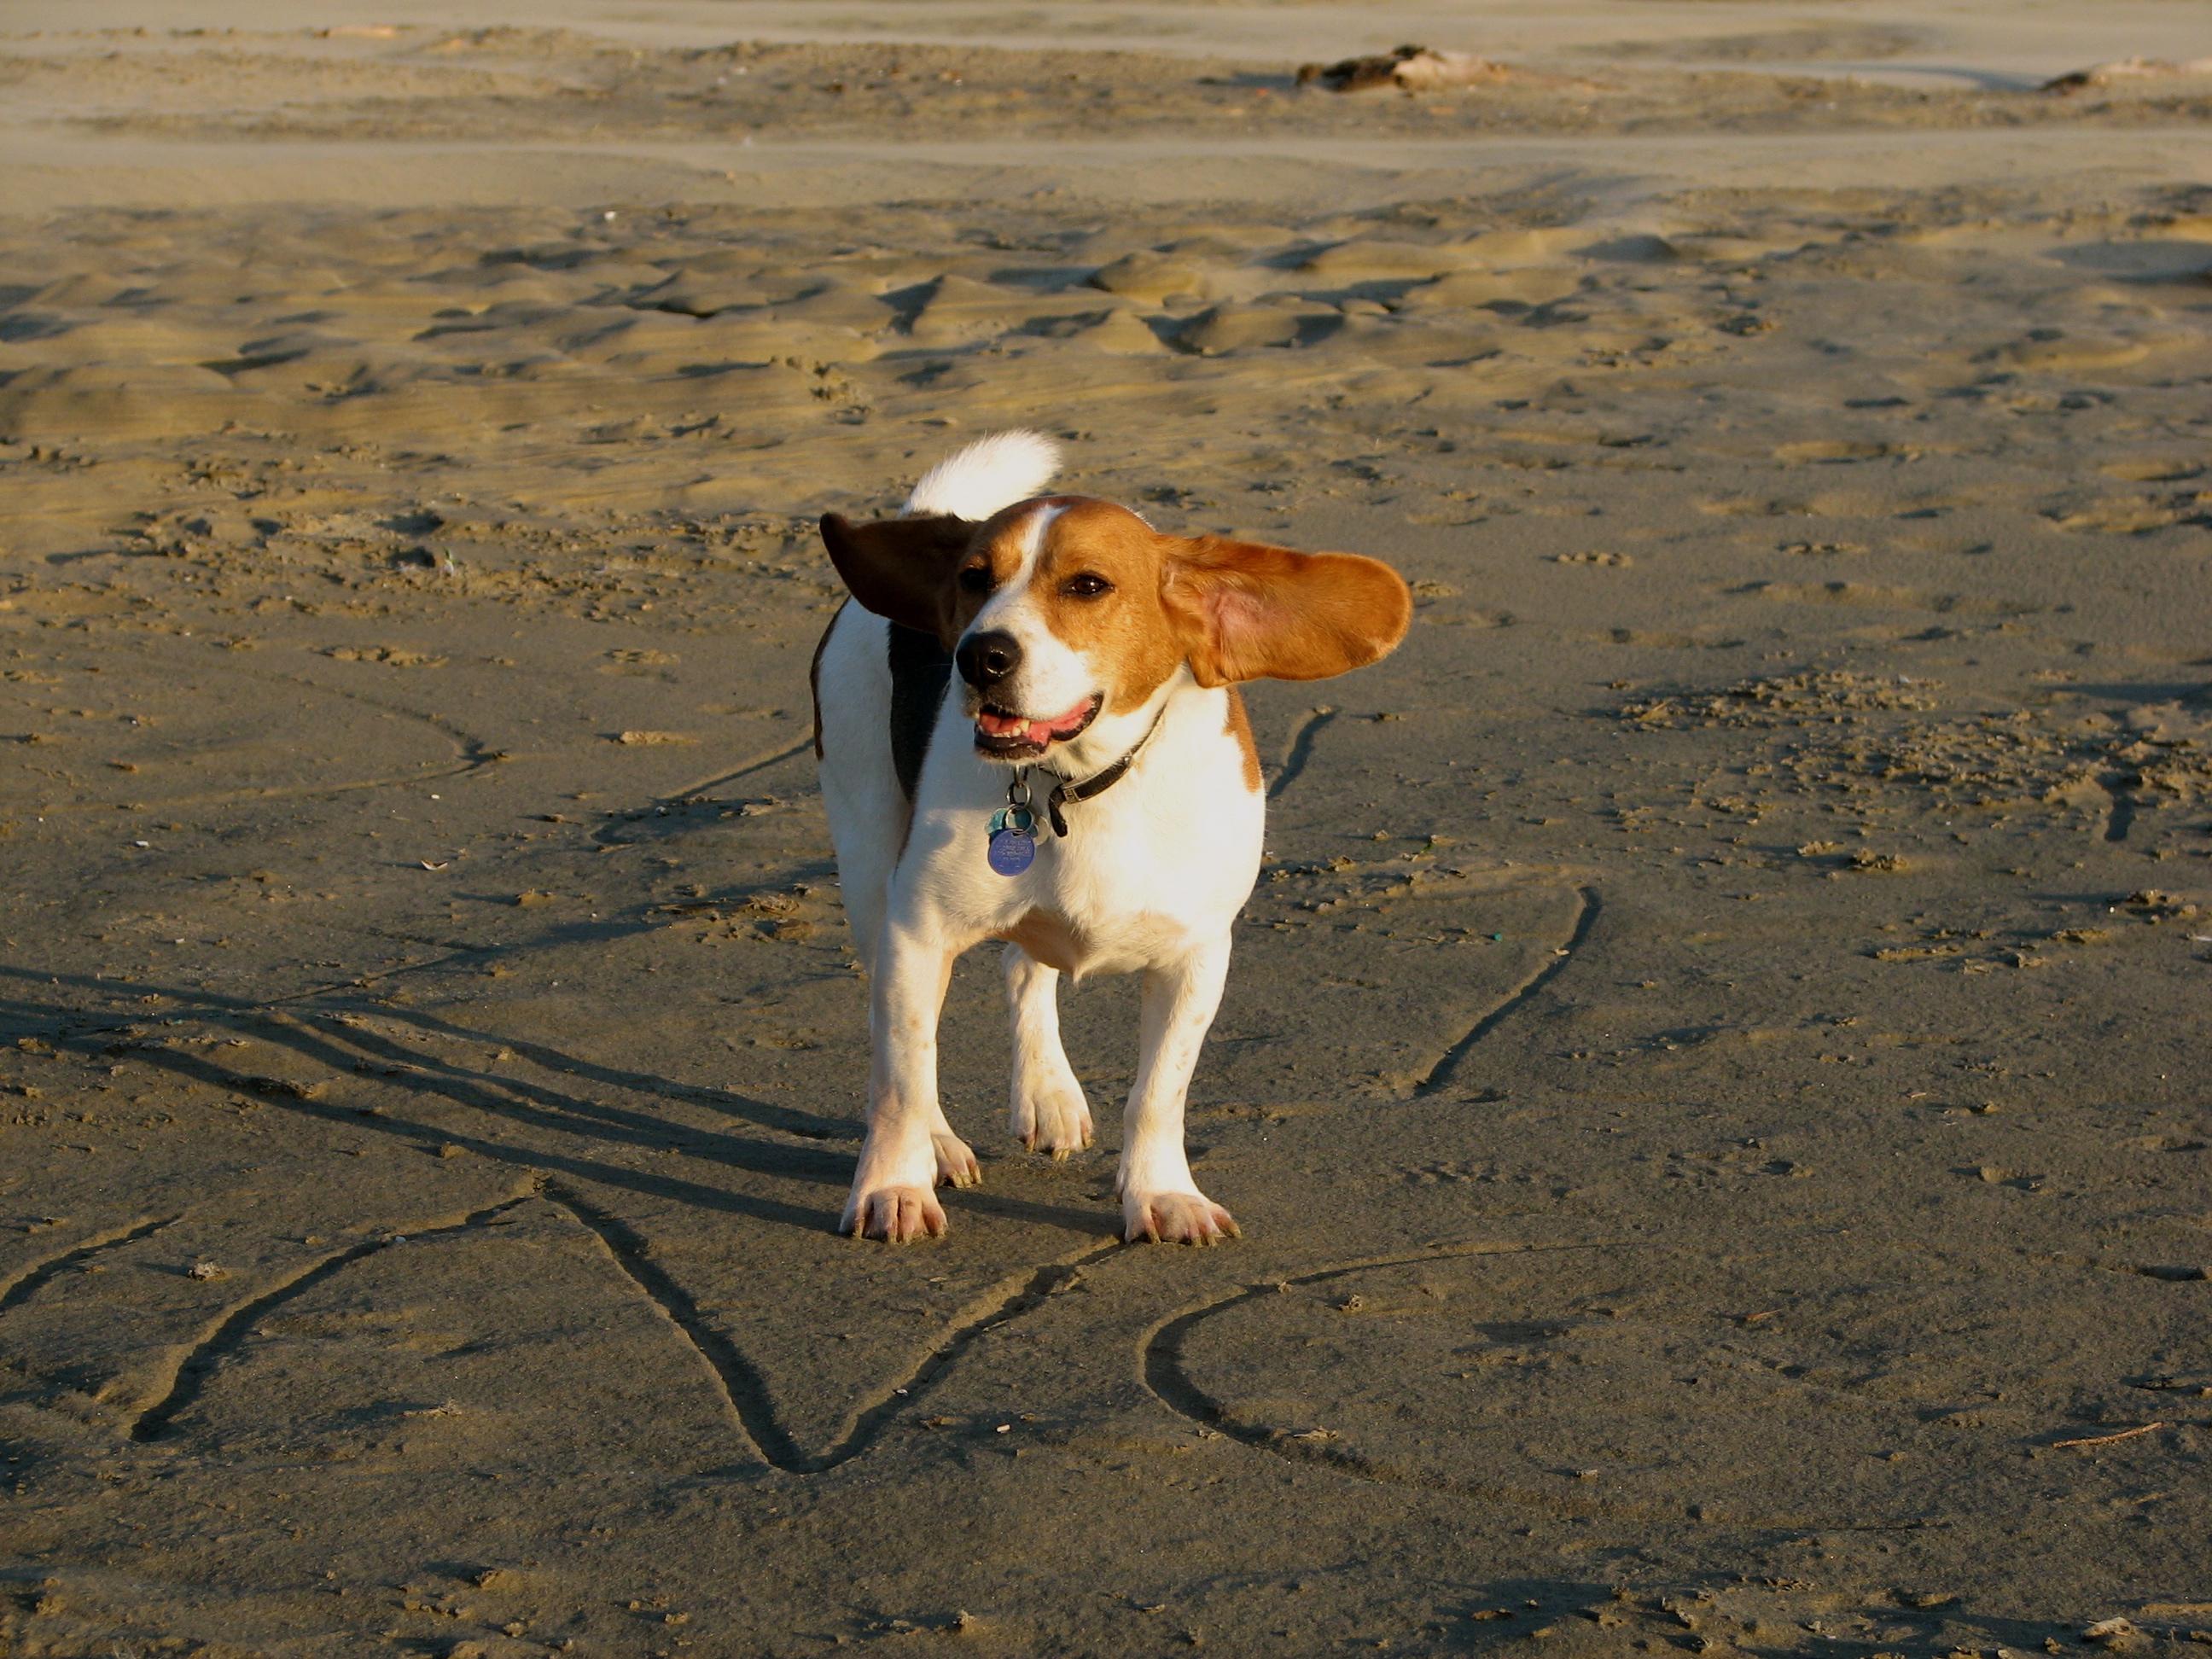 Beagle on the beach, Beach, Beagle, Dog, Pet, HQ Photo